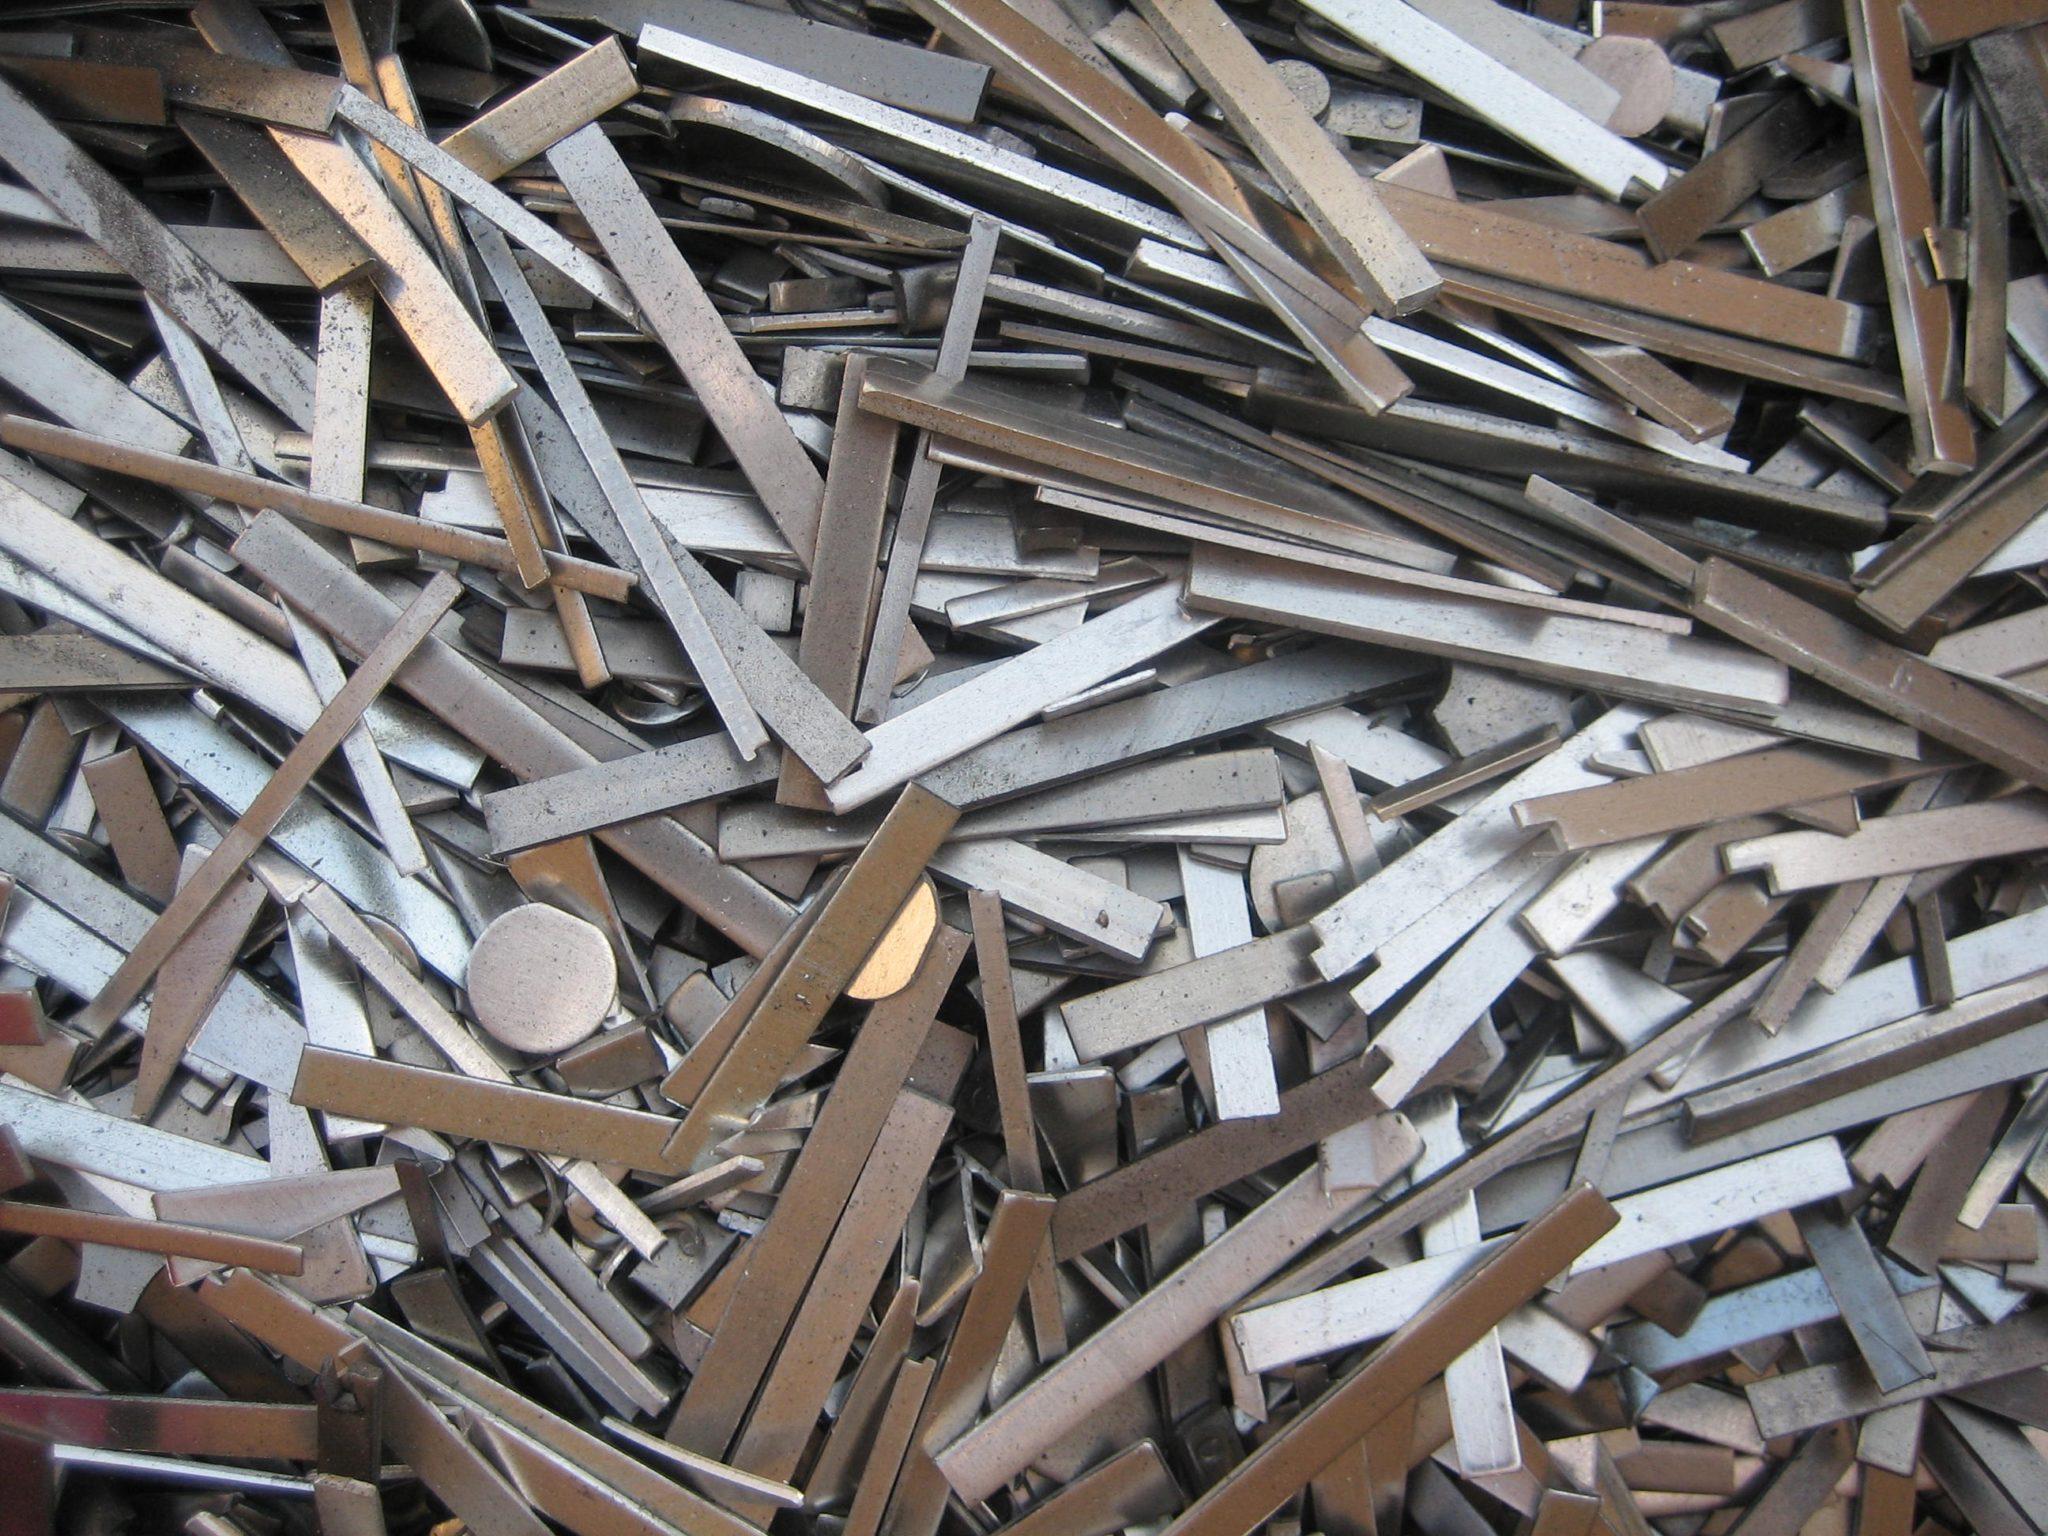 Steel Scrap Metal : Metal recycling steel copper tin main